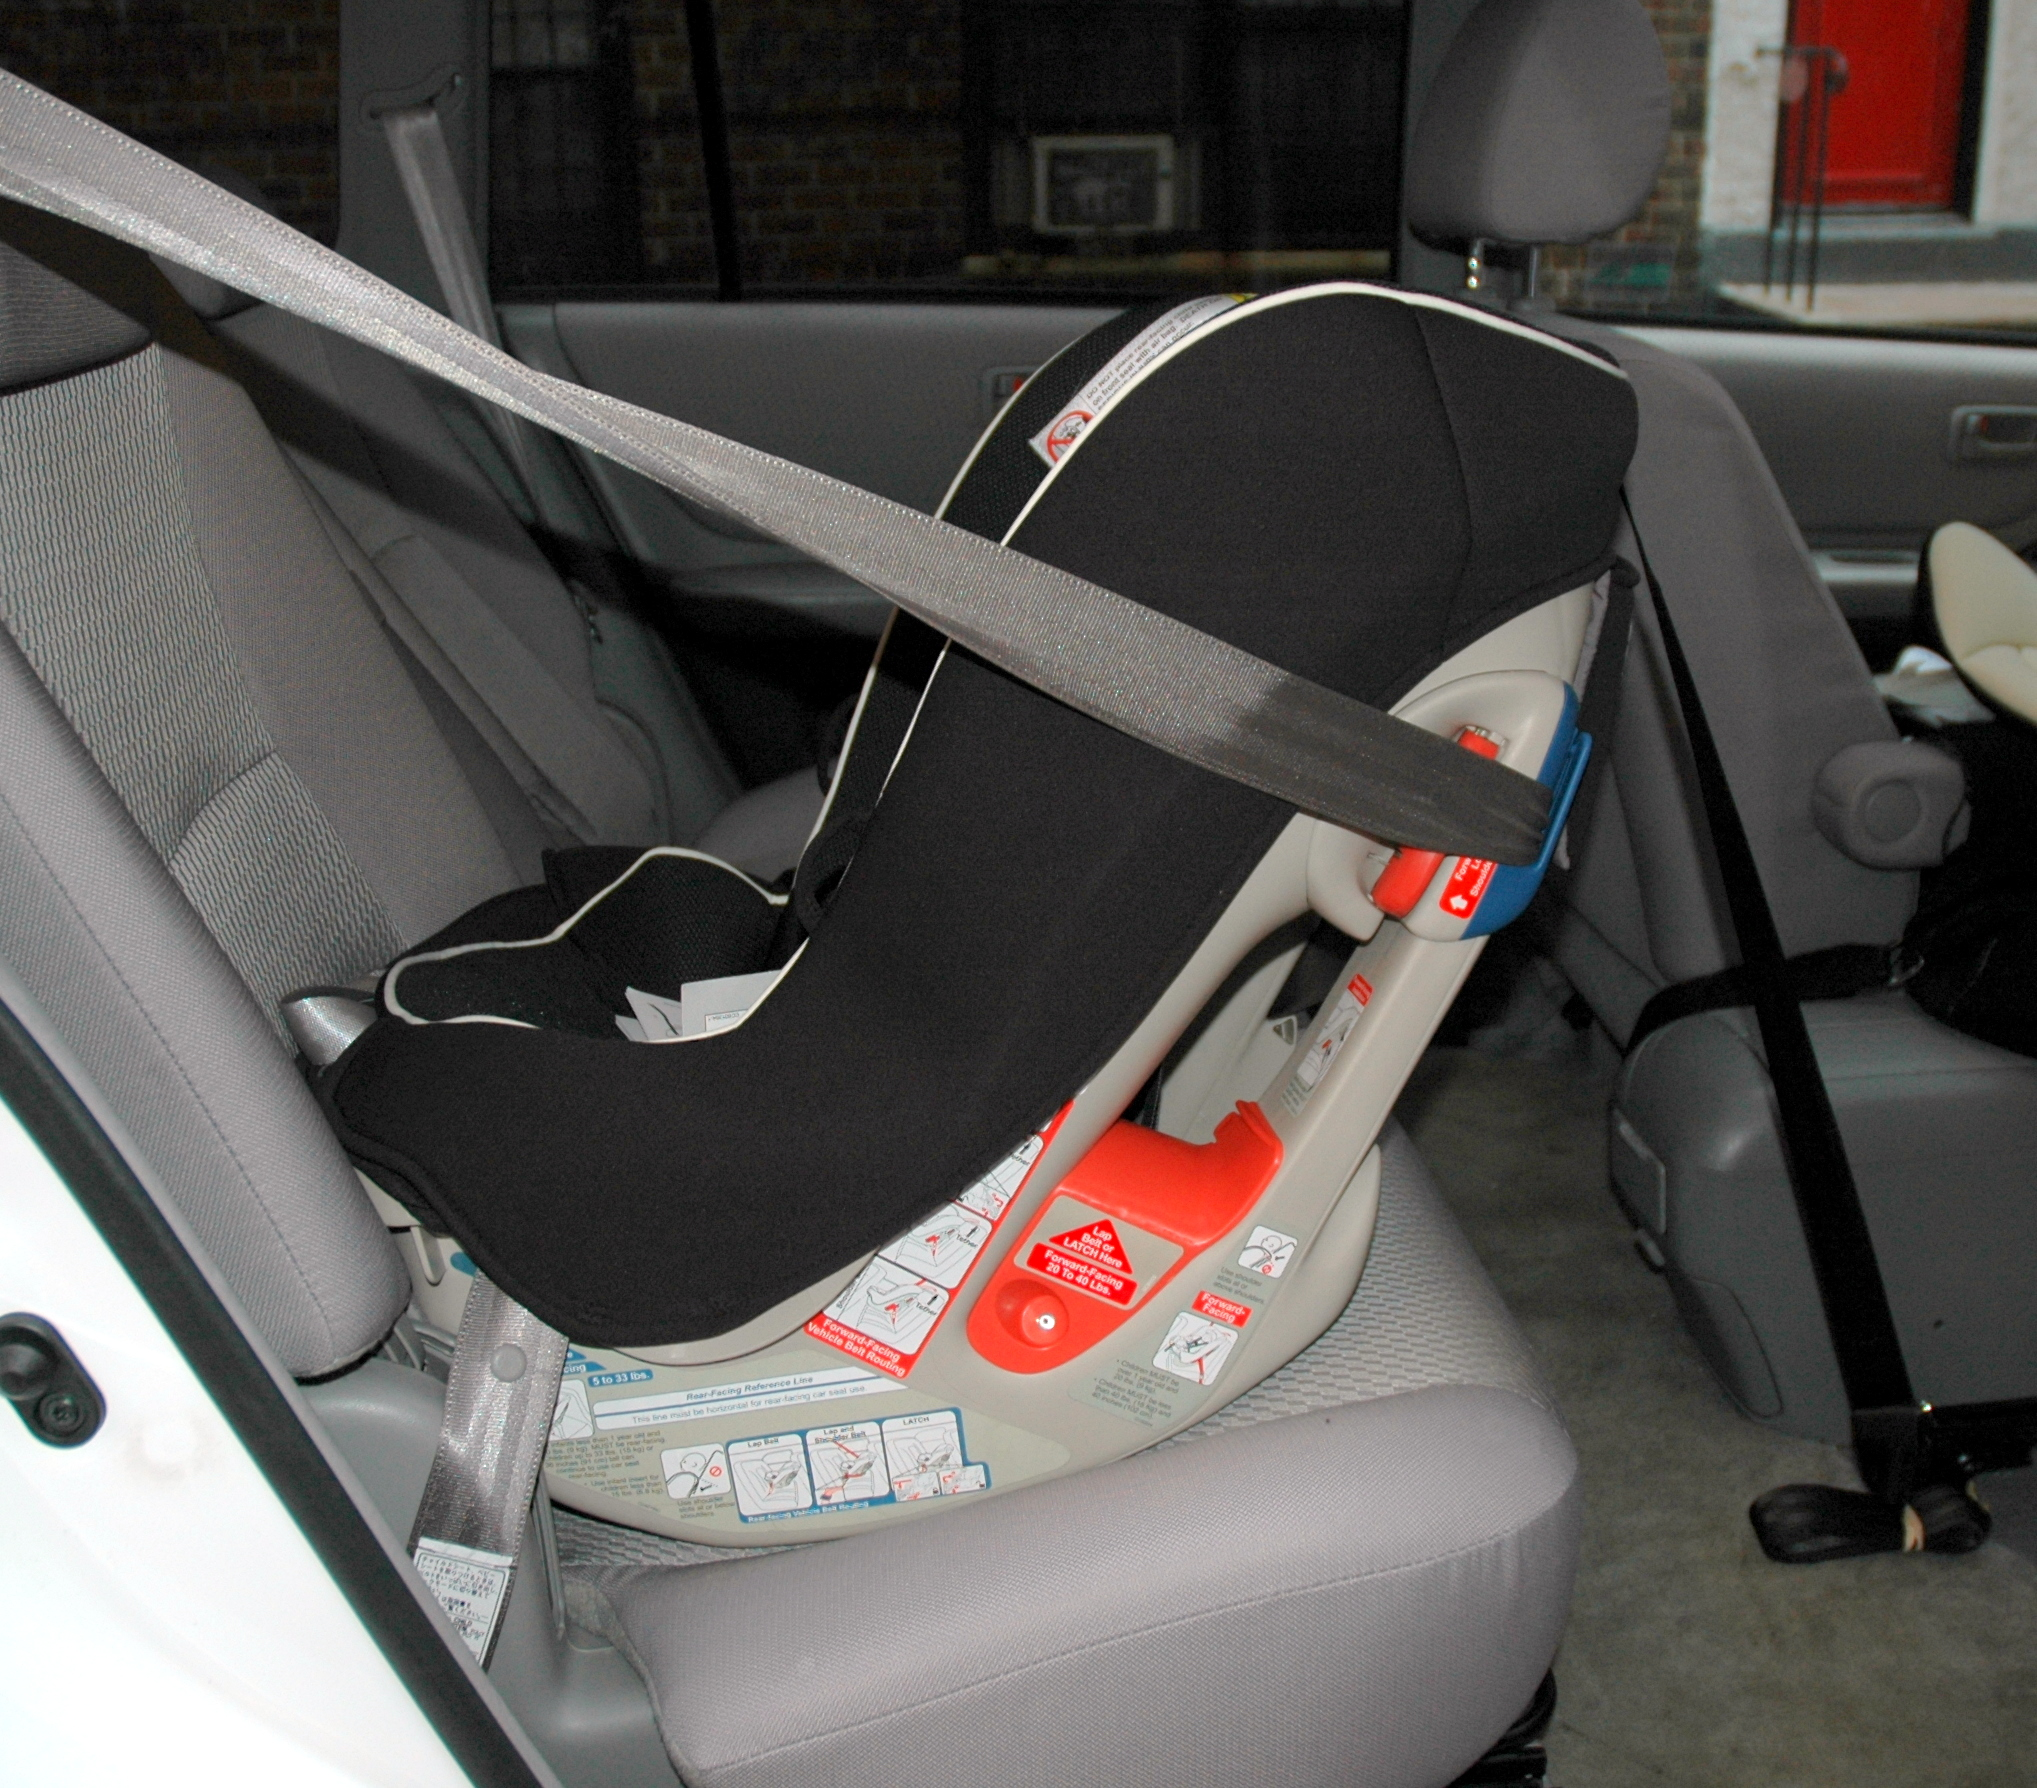 Dsc 0188 The Car Seat Lady